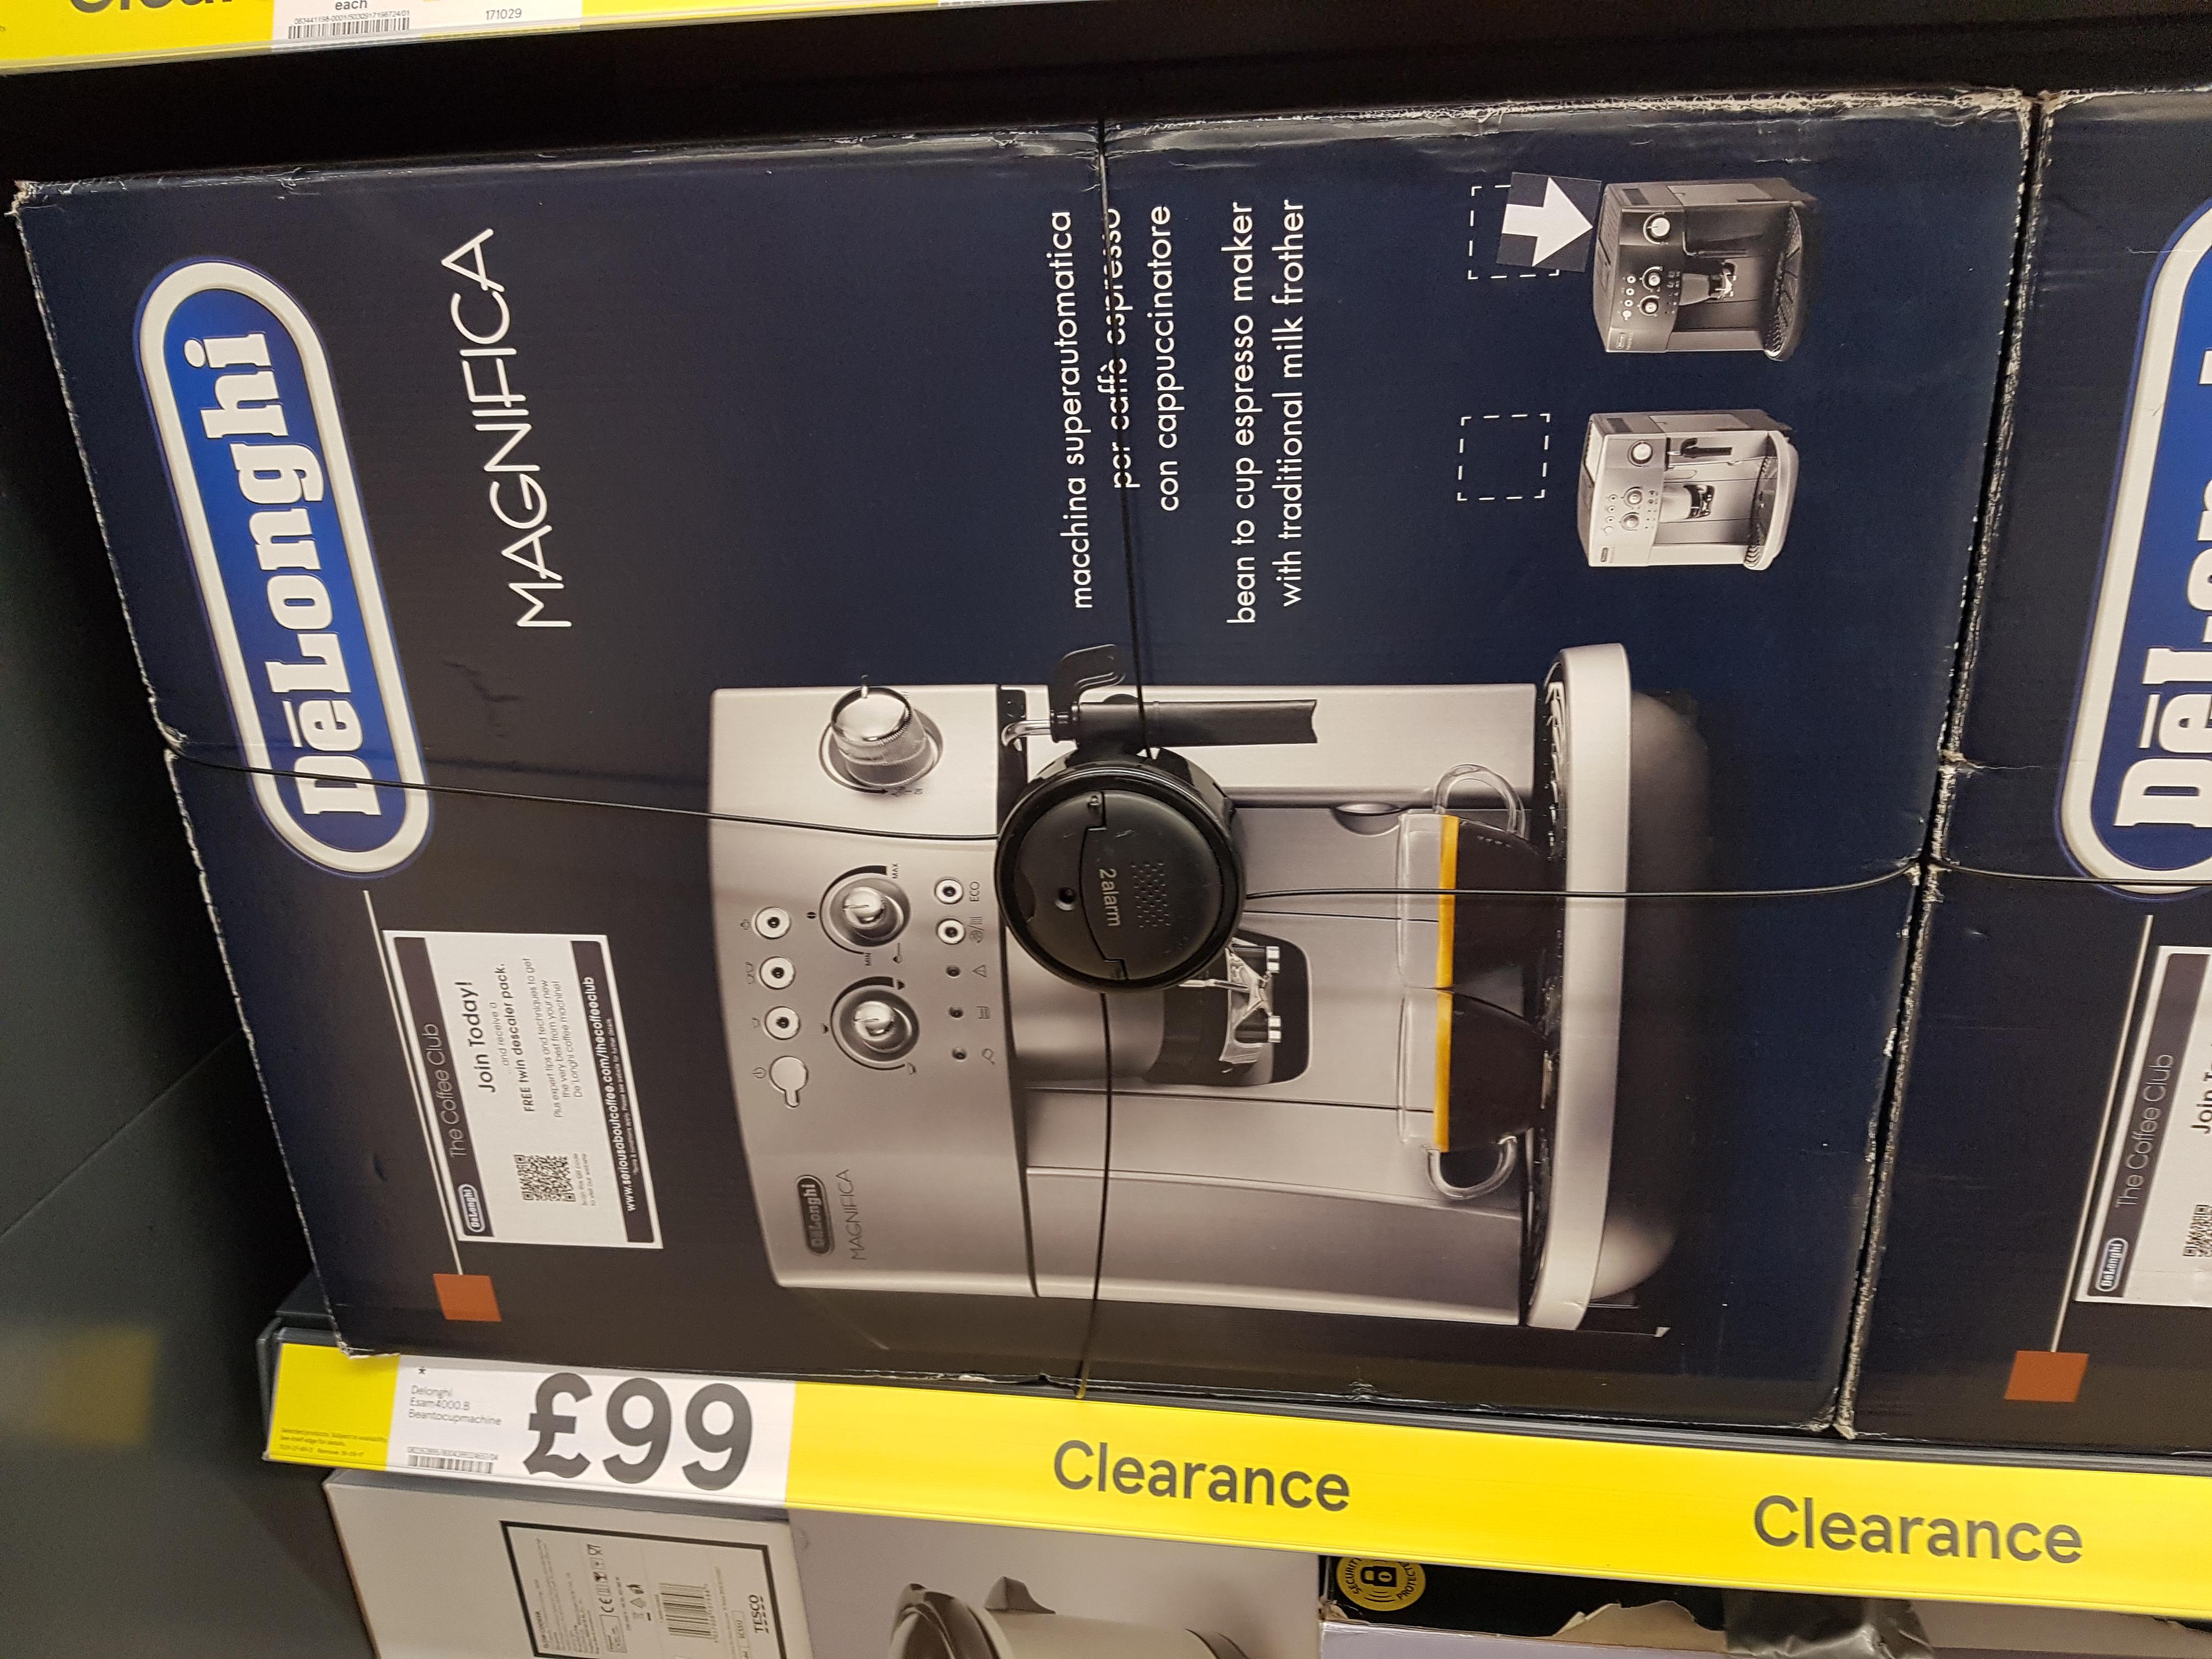 De'Longhi Magnifica ESAM 4000.B Automatic Espresso Machine £99.00 Clearance instore @ Tesco (Leicester)